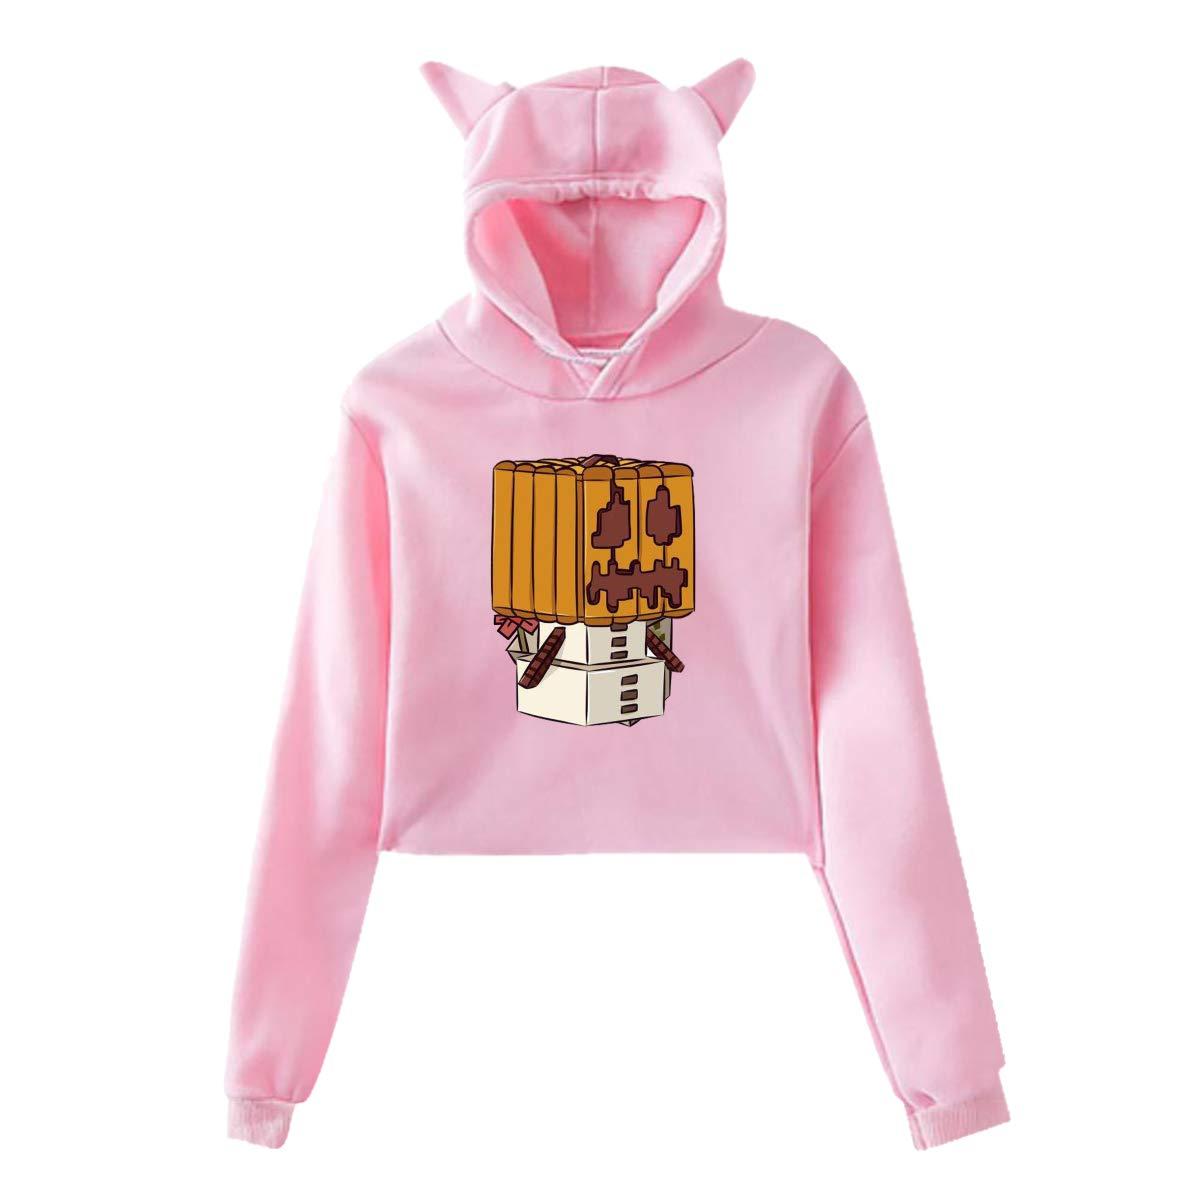 LianLiYa Women Midriff Sweatshirt Funny Snow Golem Cat Ear Pullover